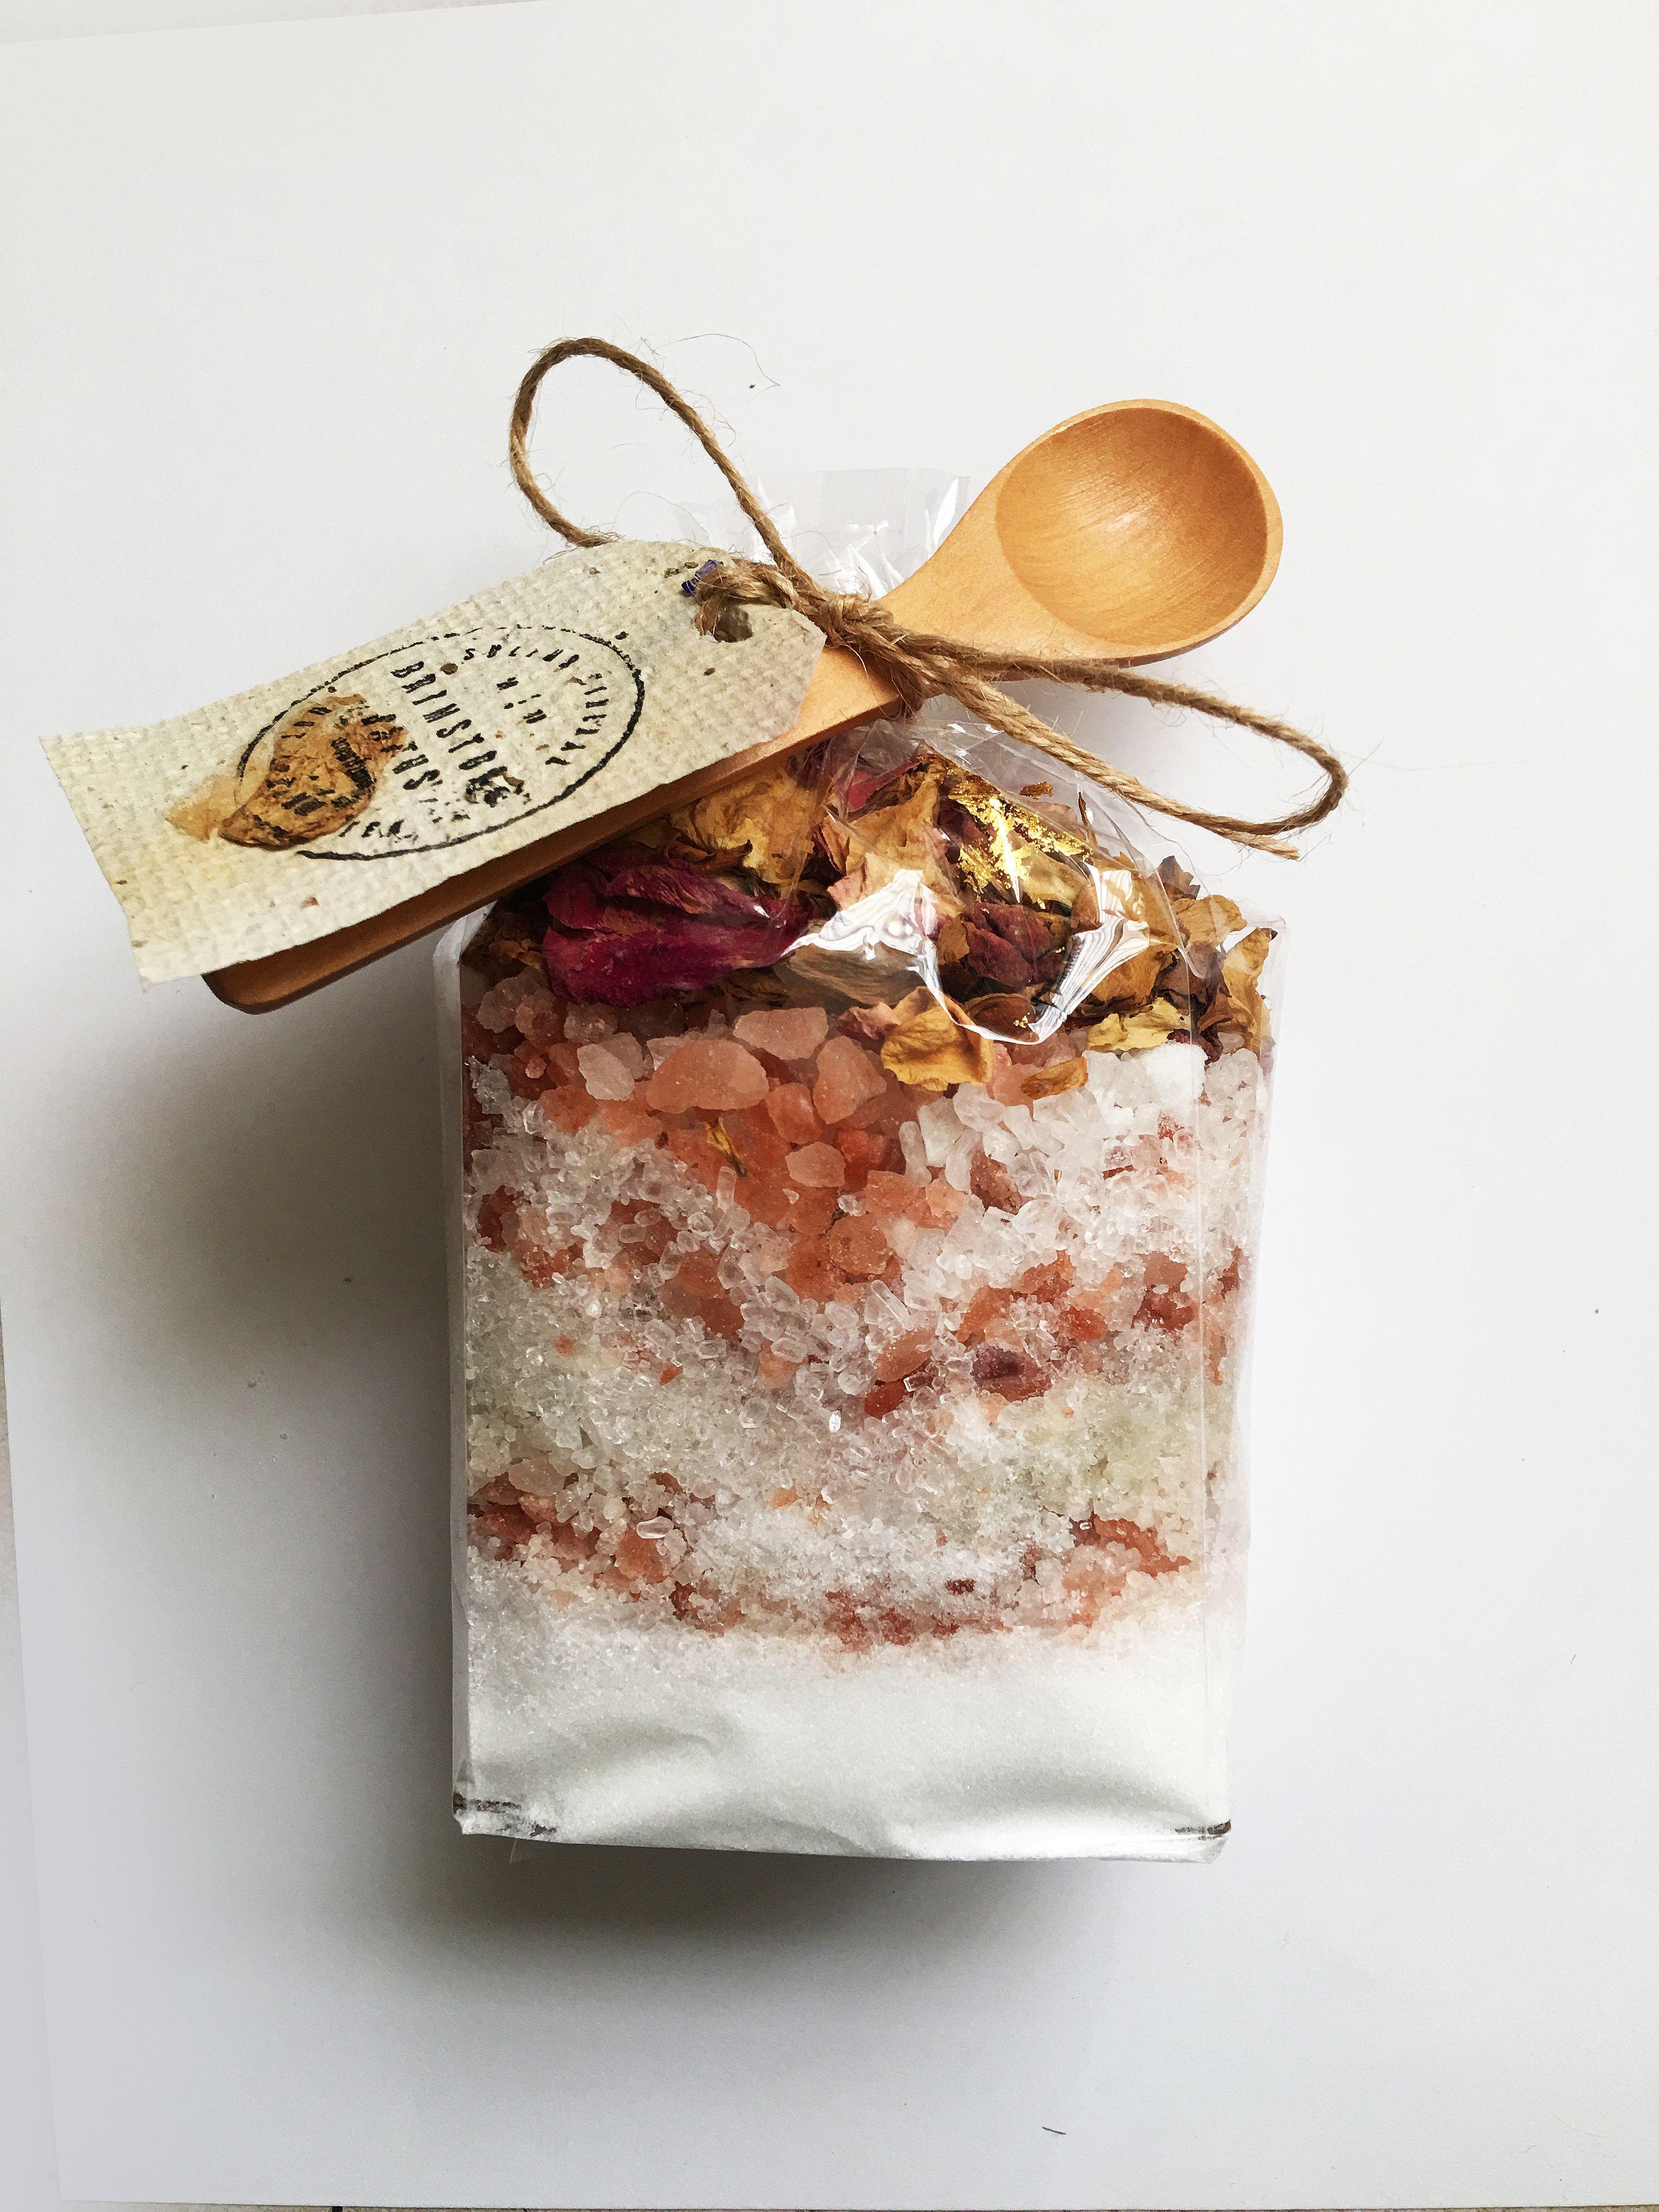 1 Pound Of Msm Dead Sea Salt Himalayan Salt Epsom Salt